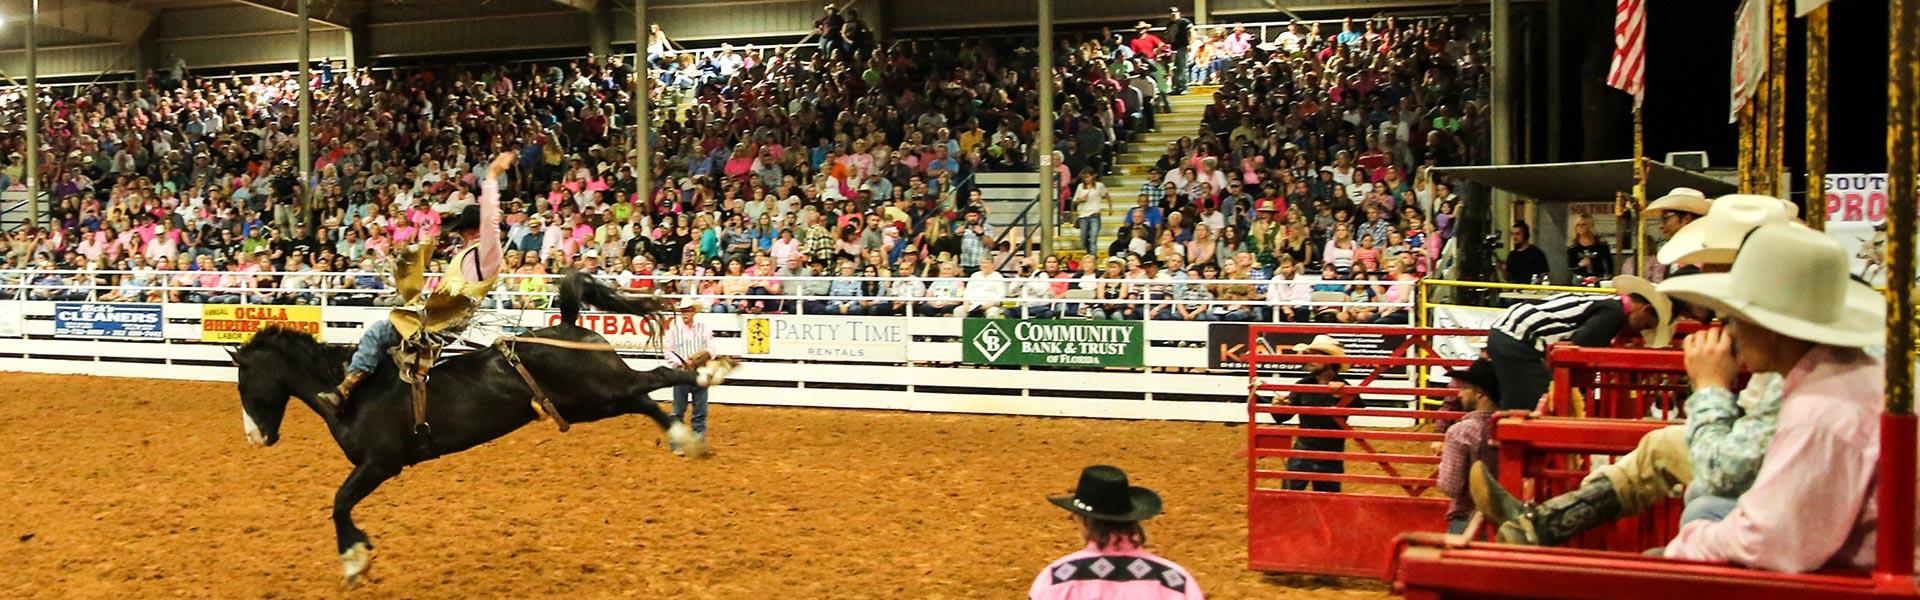 Venue Information Ocala Southeastern Pro Rodeo